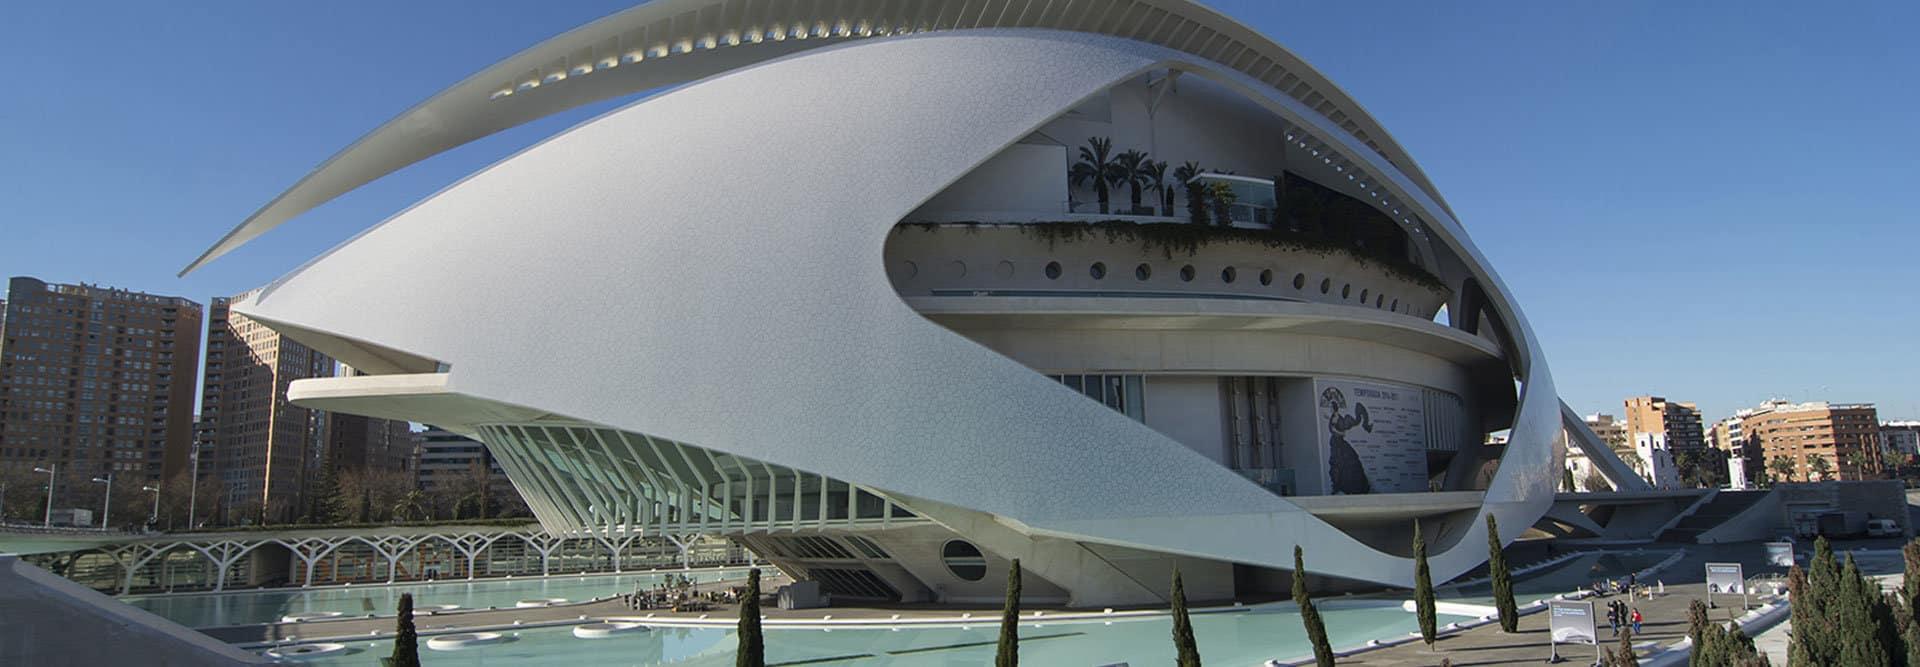 Palau-de-les-arts-Reina-Sofia-Valencia-experiences-and-gateways